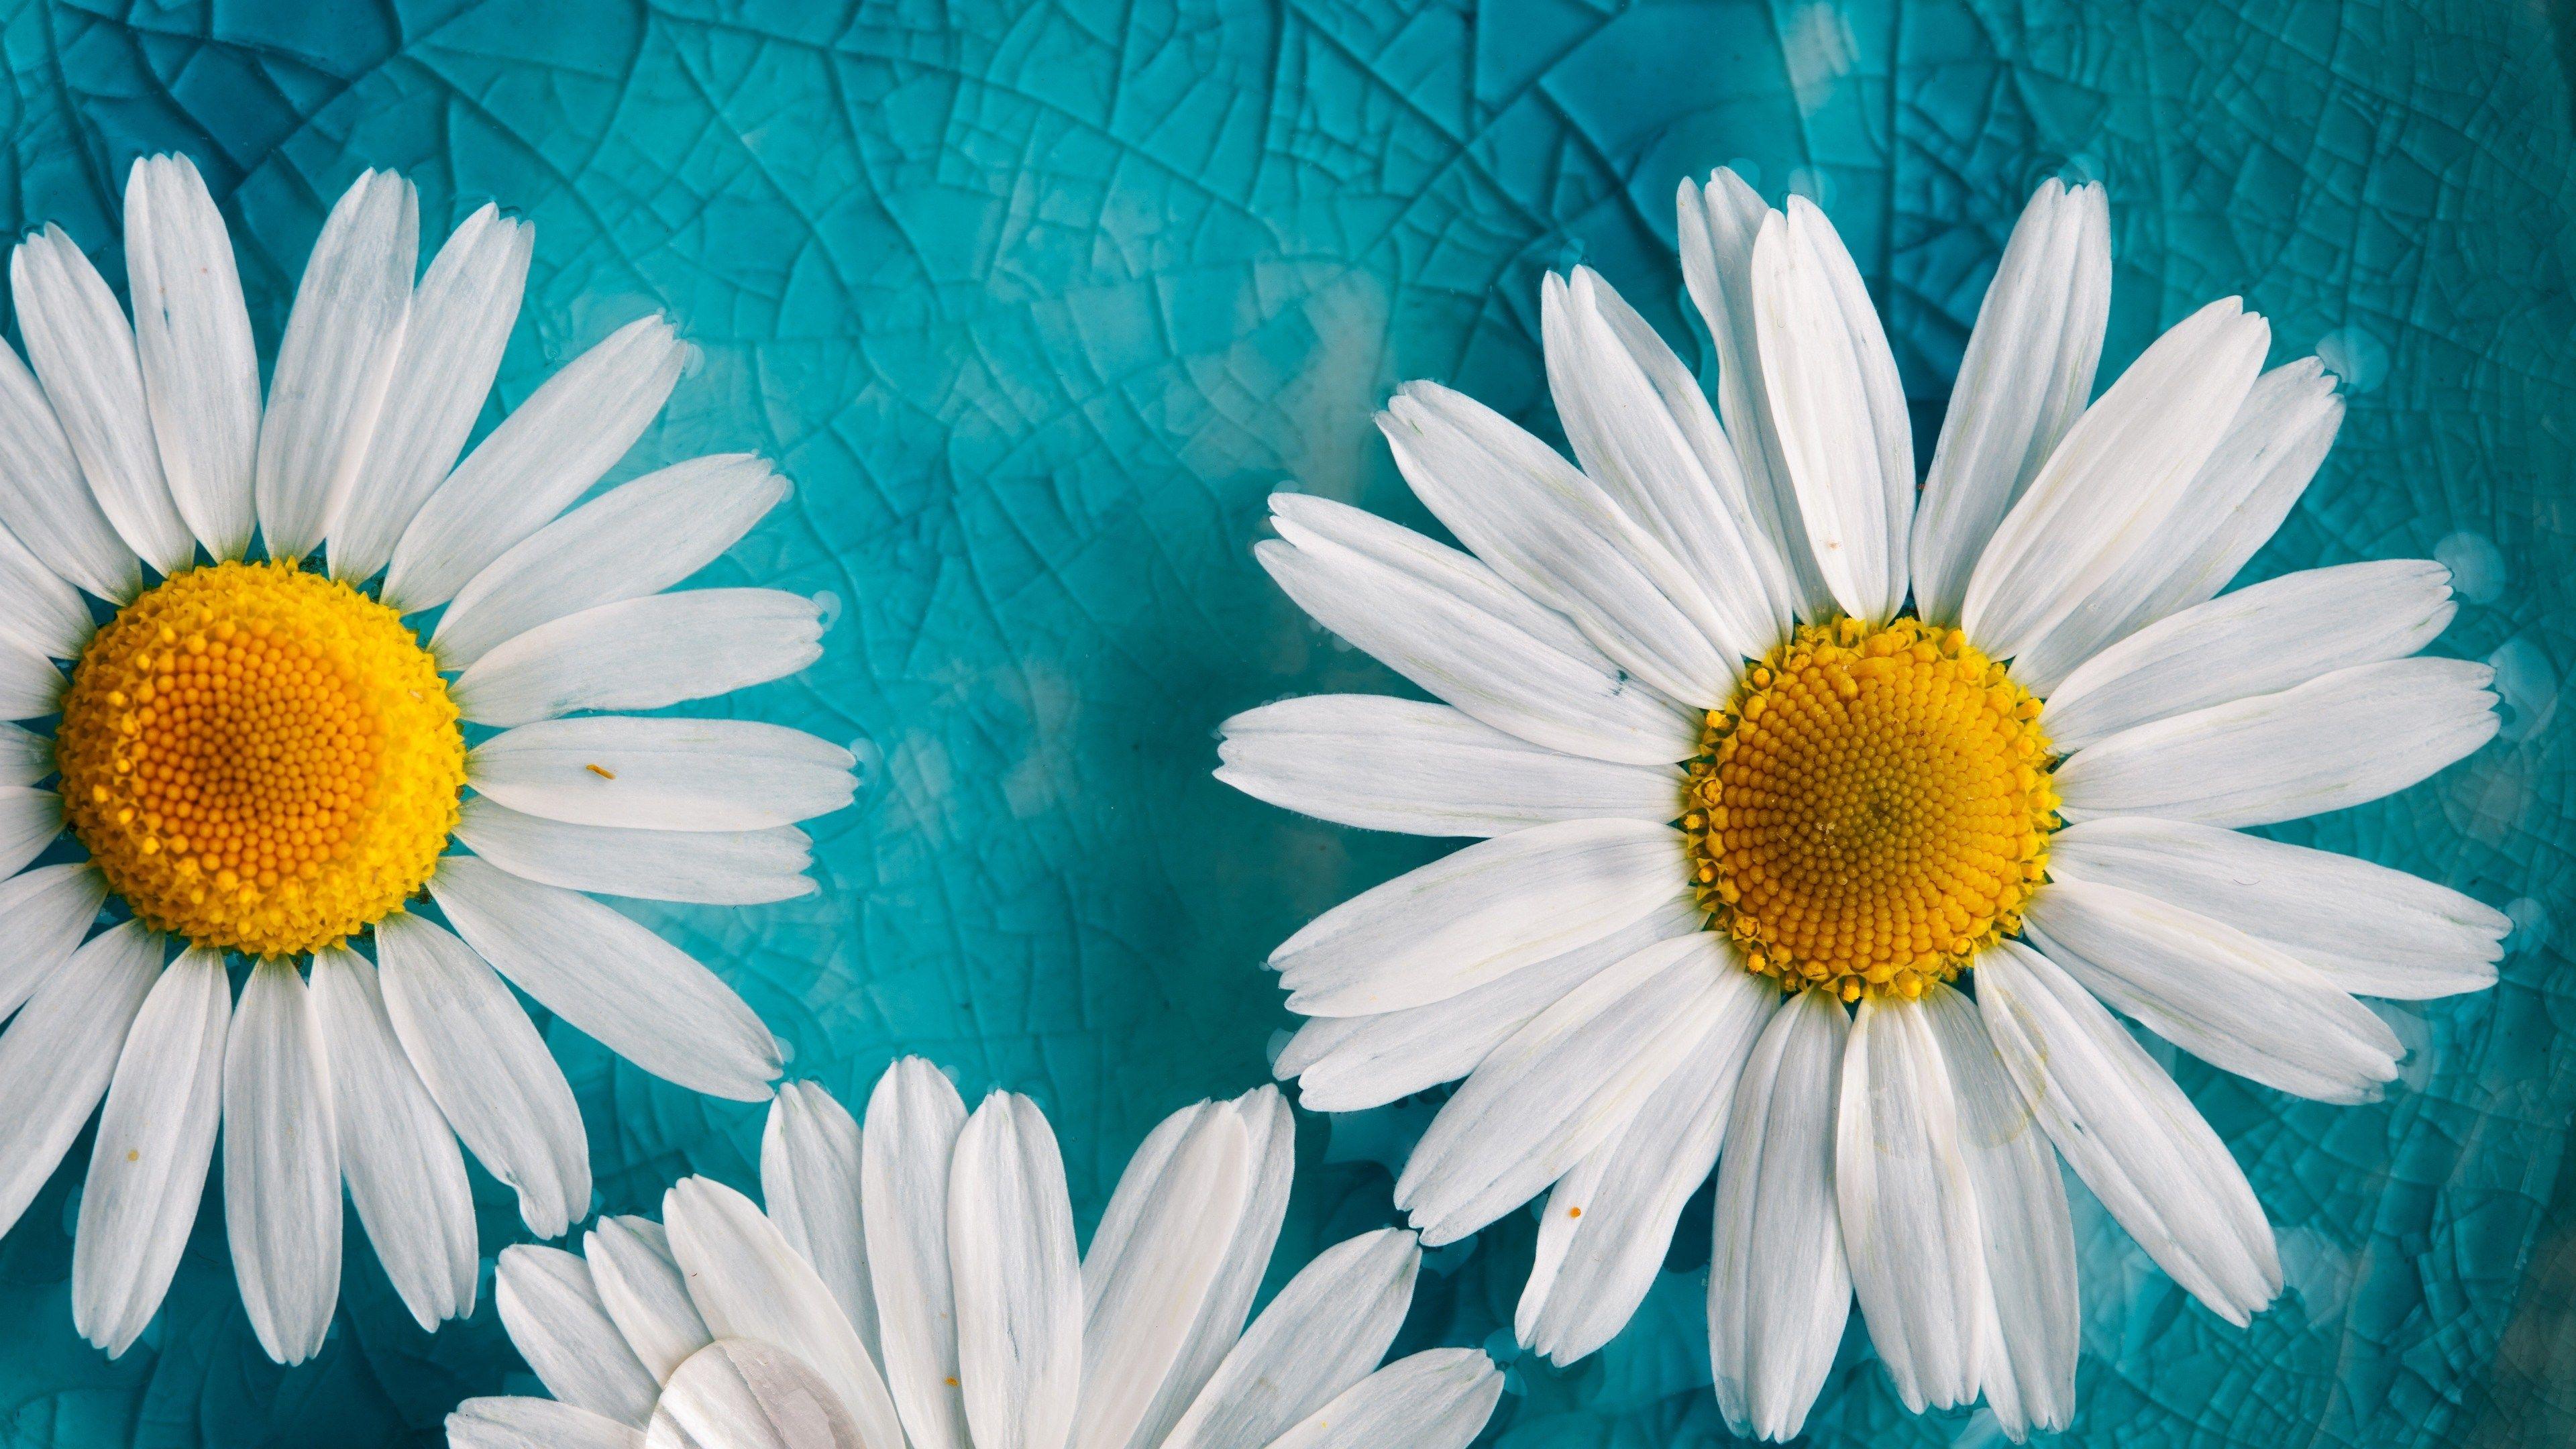 4k Pc Desktop Hd Wallpaper 3840x2160 White Sunflowers Blue Art Prints Flower Backgrounds